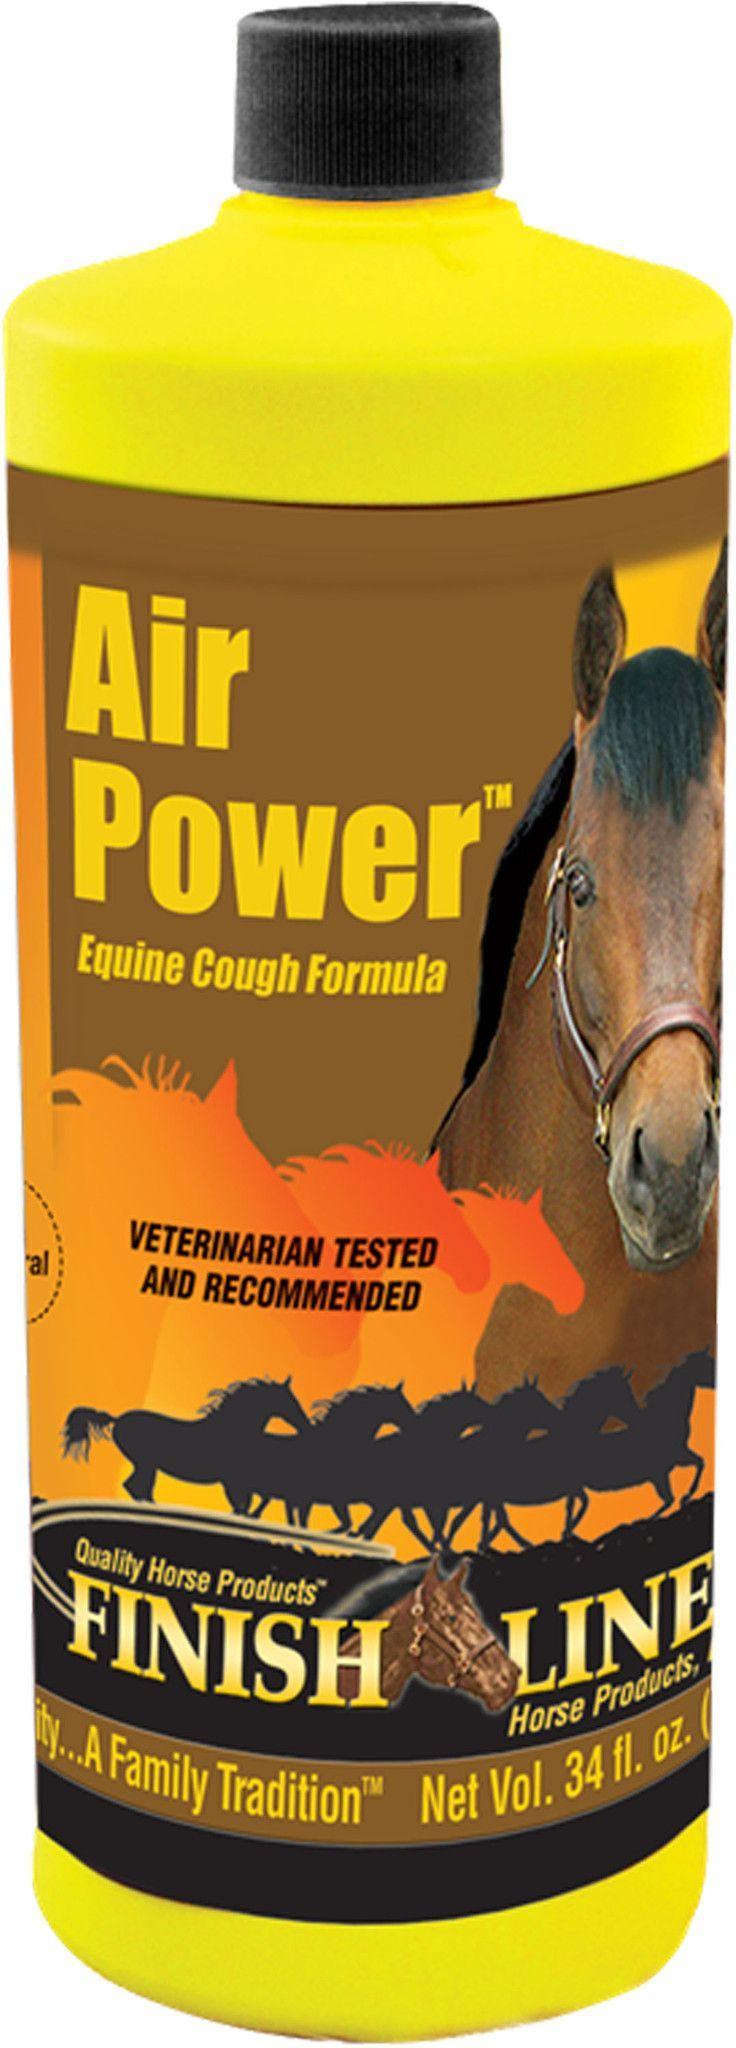 Air Power Equine Cough Formula Cough Finish Line Power